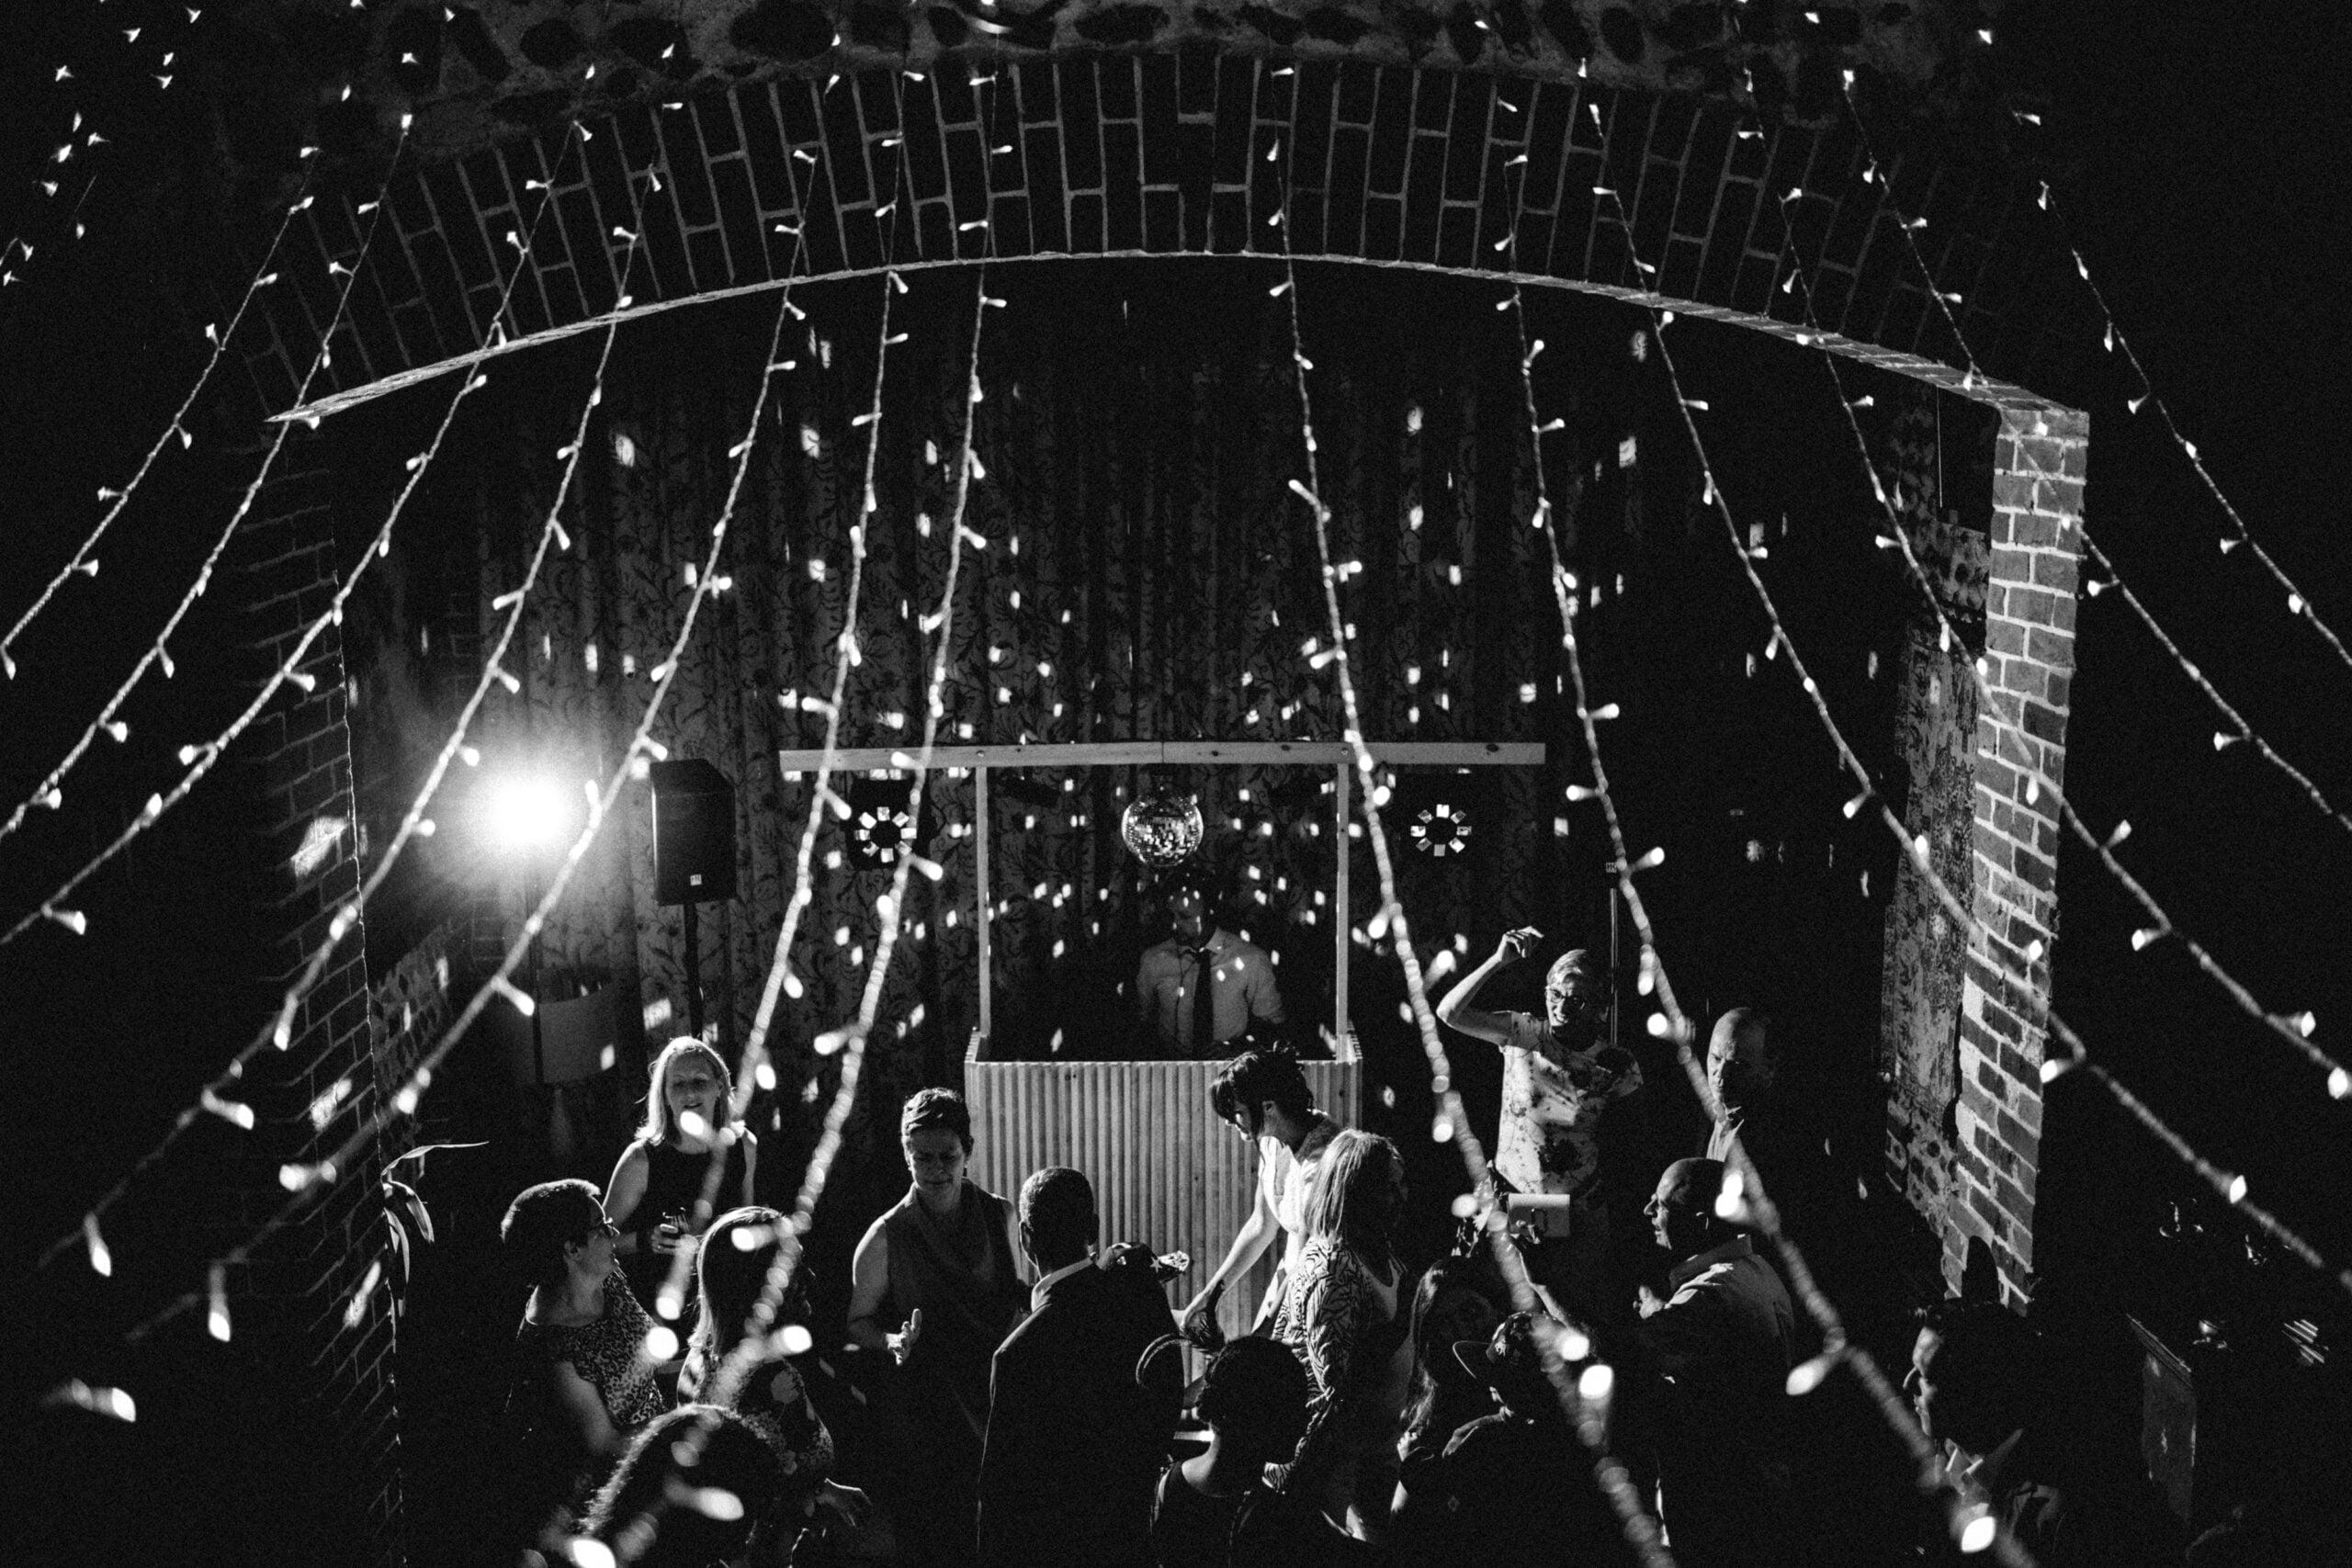 Norfolk lighting at Chaucer Barn